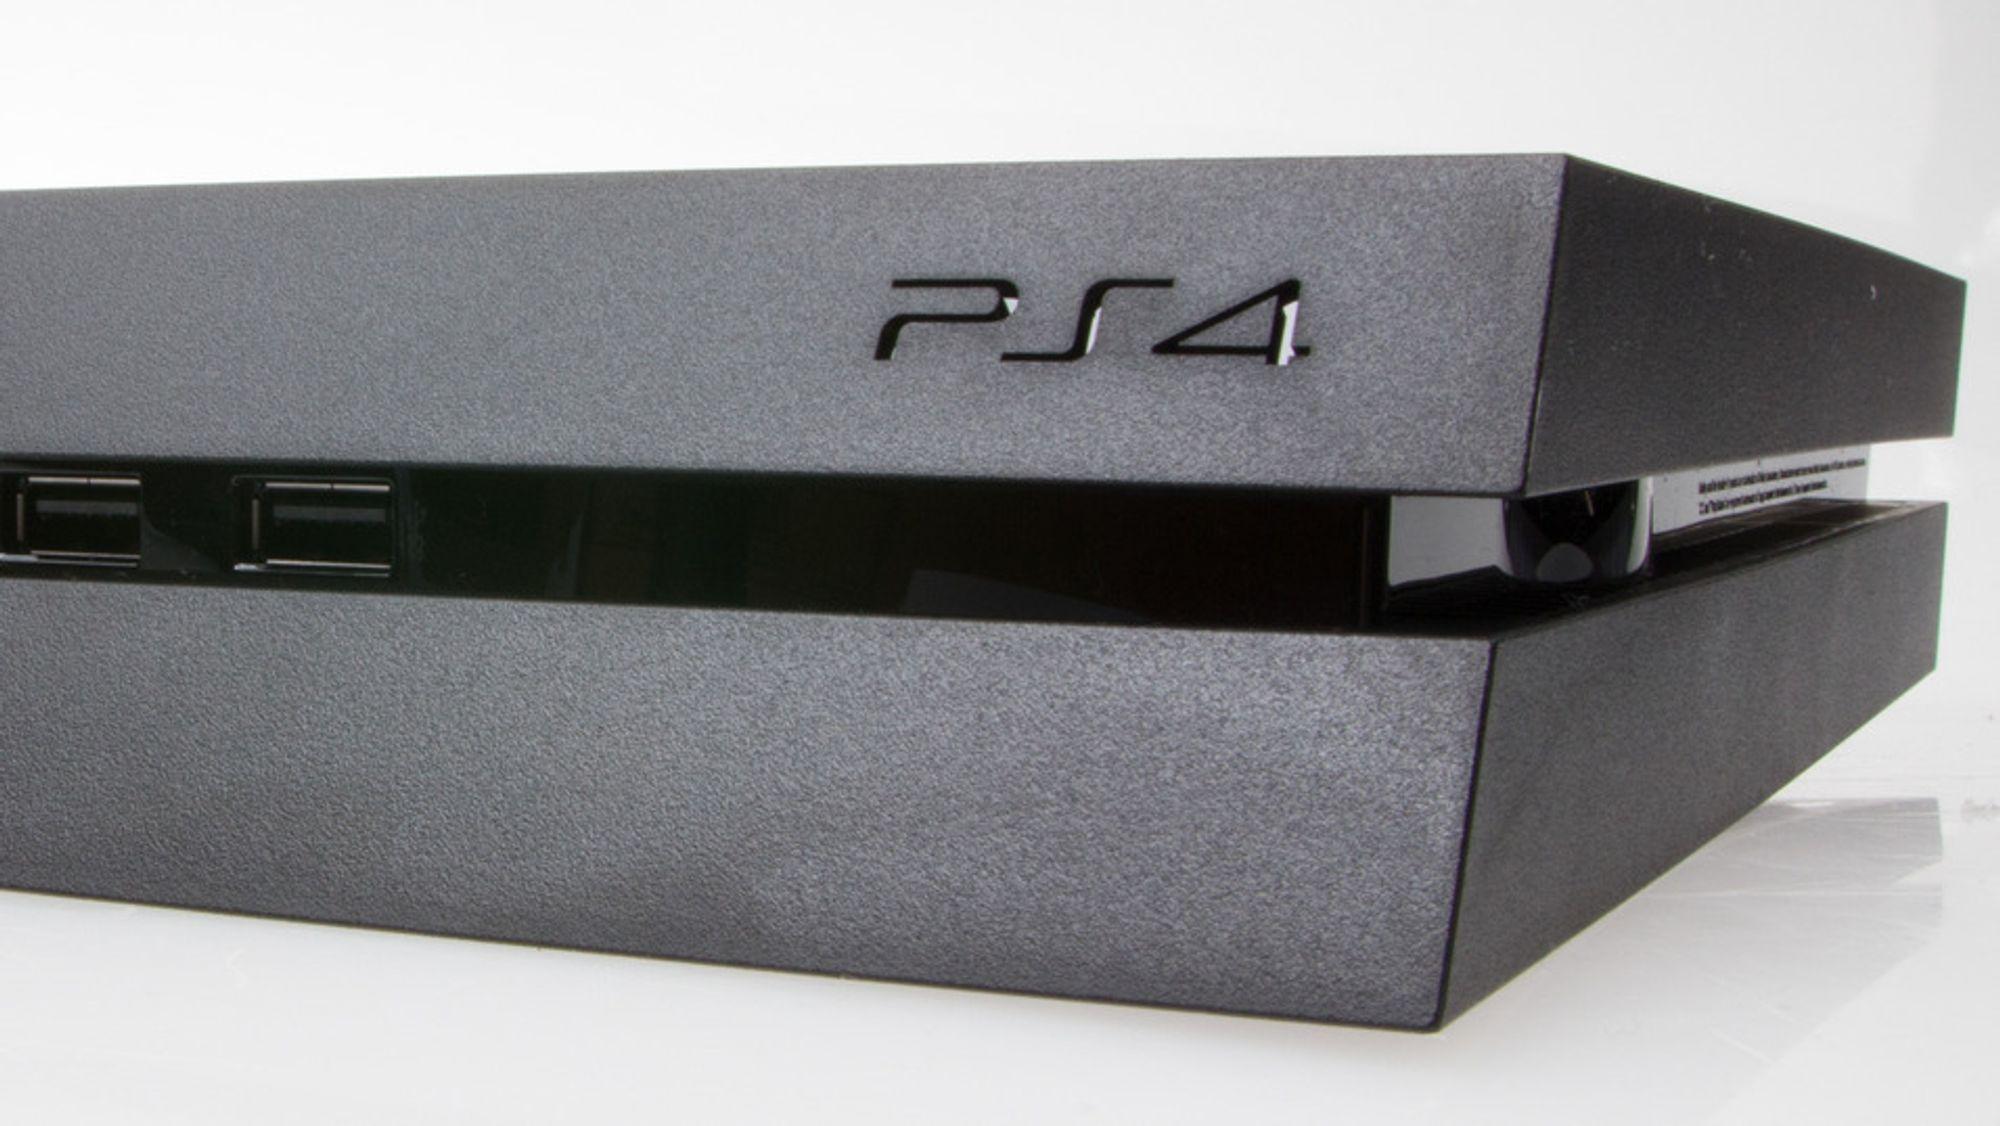 Mann ble drept da han ville selge PlayStation 4-konsollen sin.